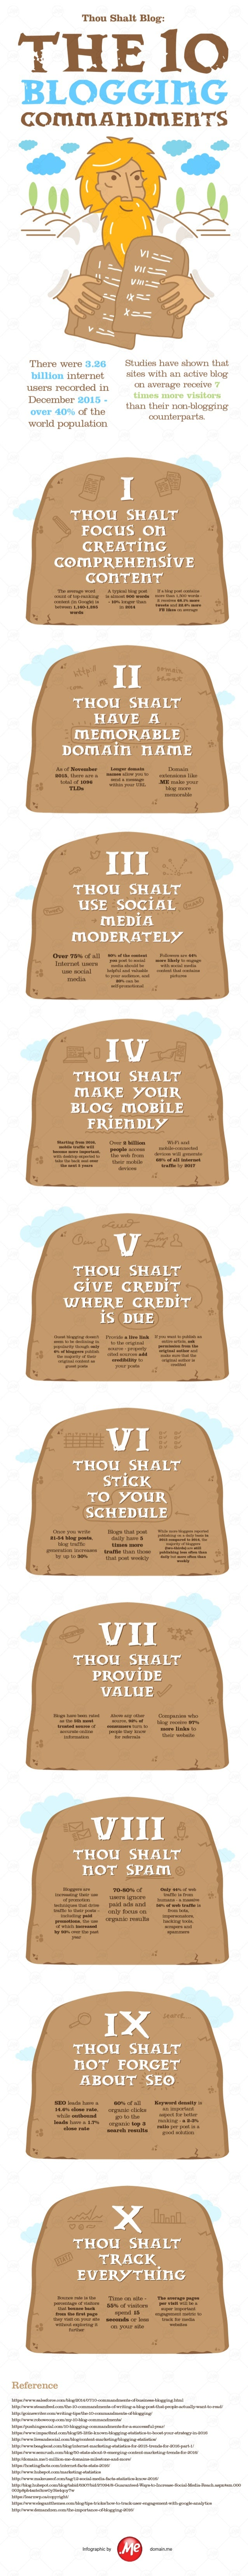 Infographic: Thou Shalt Blog – The 10 Blogging Commandments